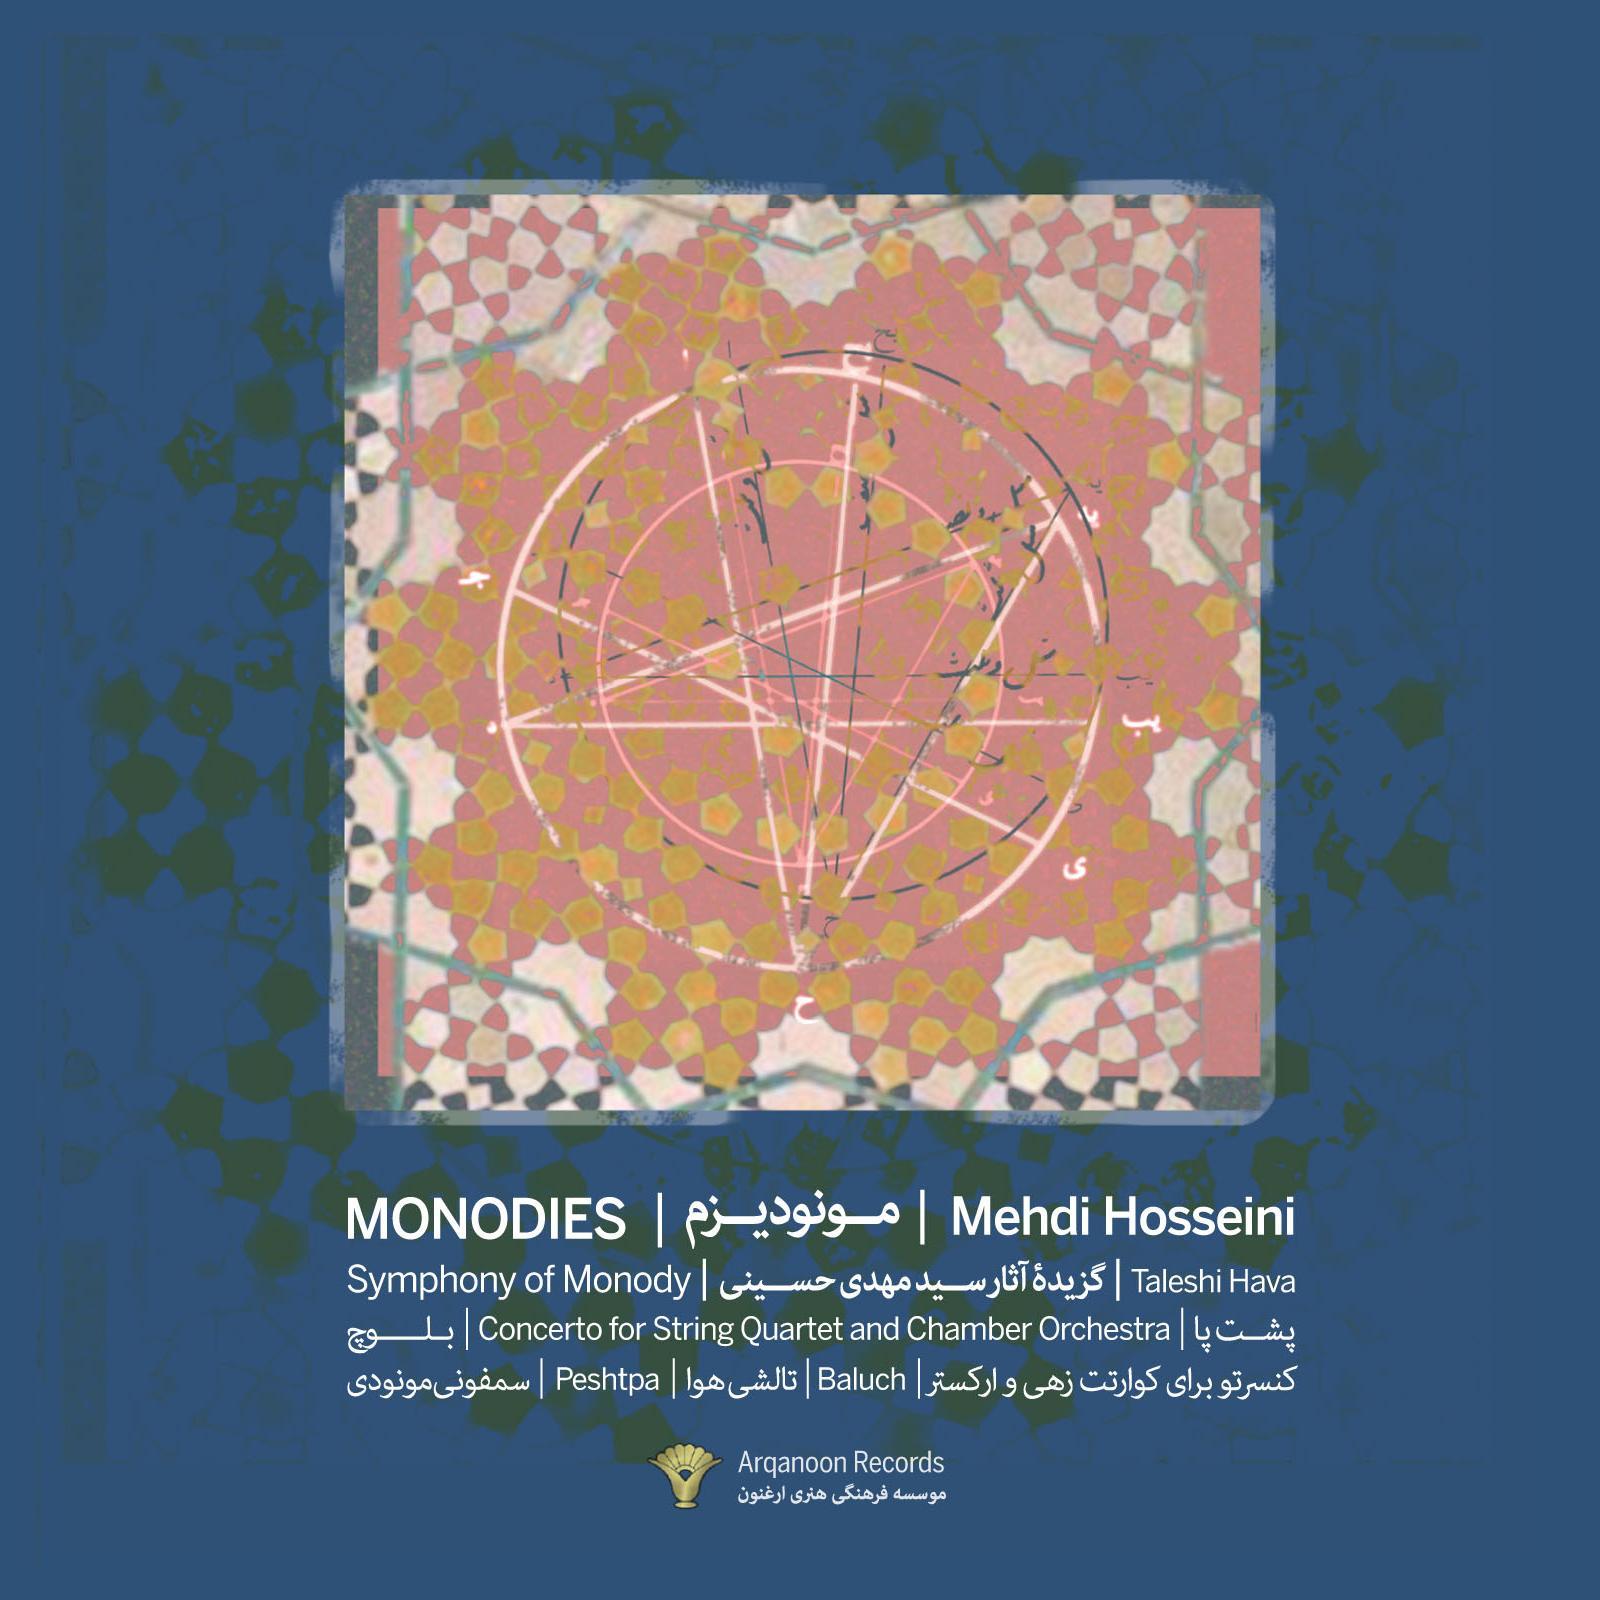 http://www.monodies.com/wp-content/uploads/2019/02/Monodies_Mehdi-Hosseini__1600x1600.jpg